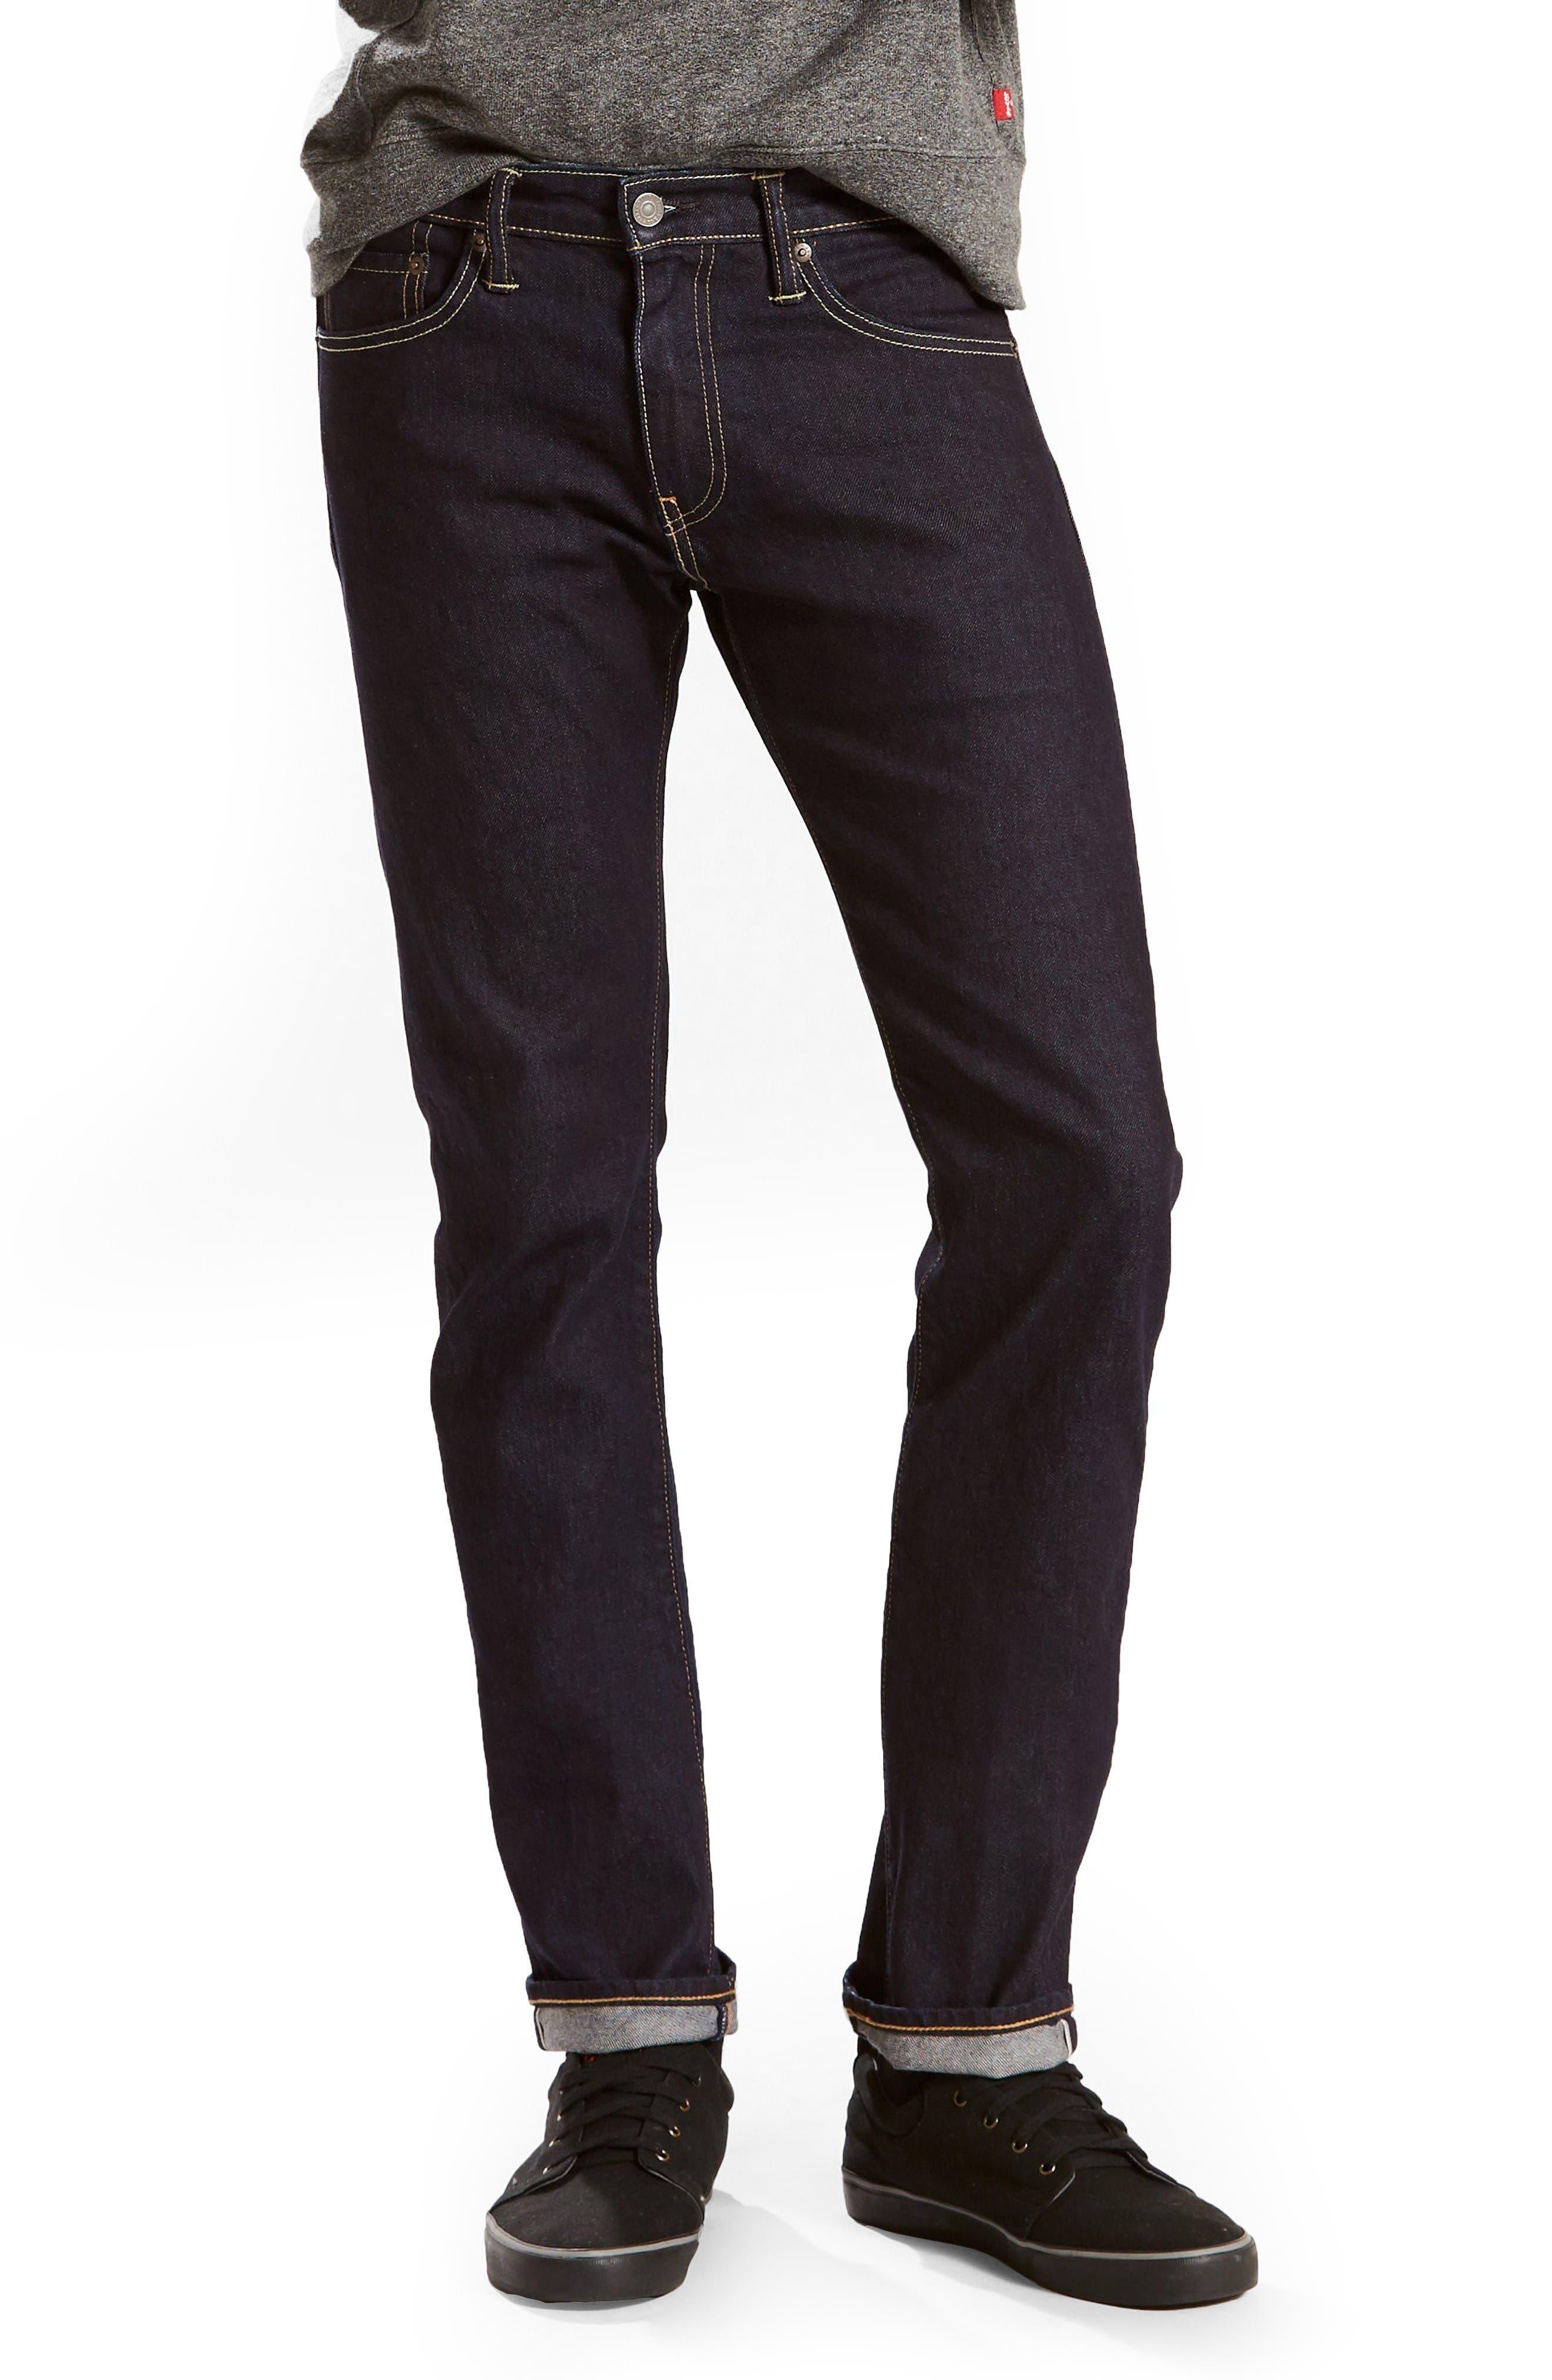 Levi's 511 Slim Fit Jeans (Selvedge Stirline)